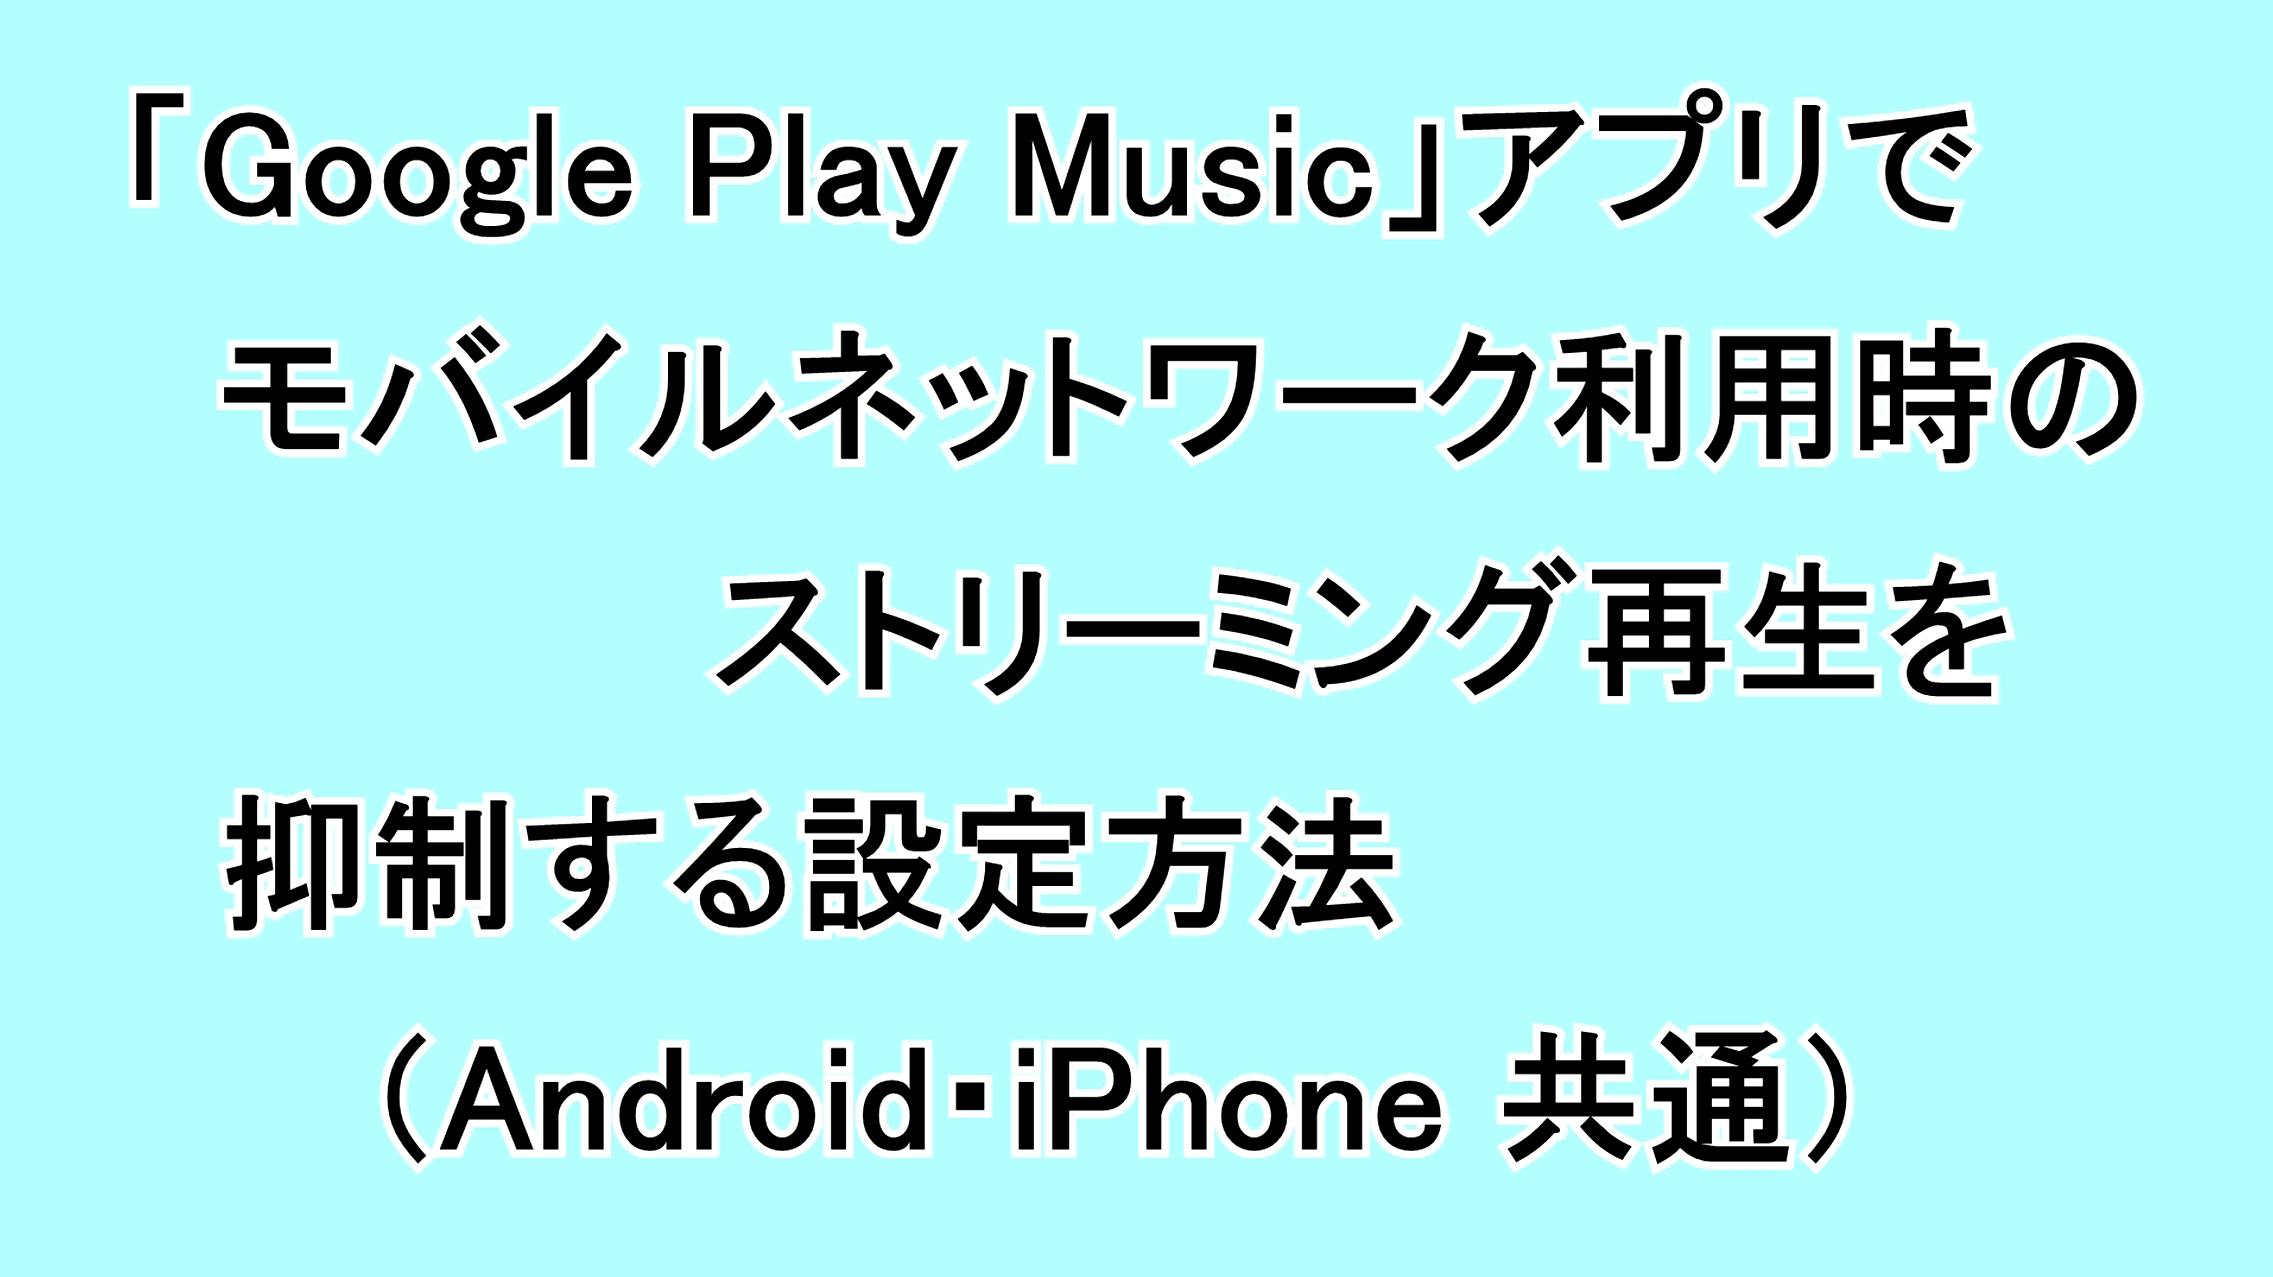 「Google Play Music」アプリでモバイルネットワーク利用時のストリーミング再生を抑制する設定方法